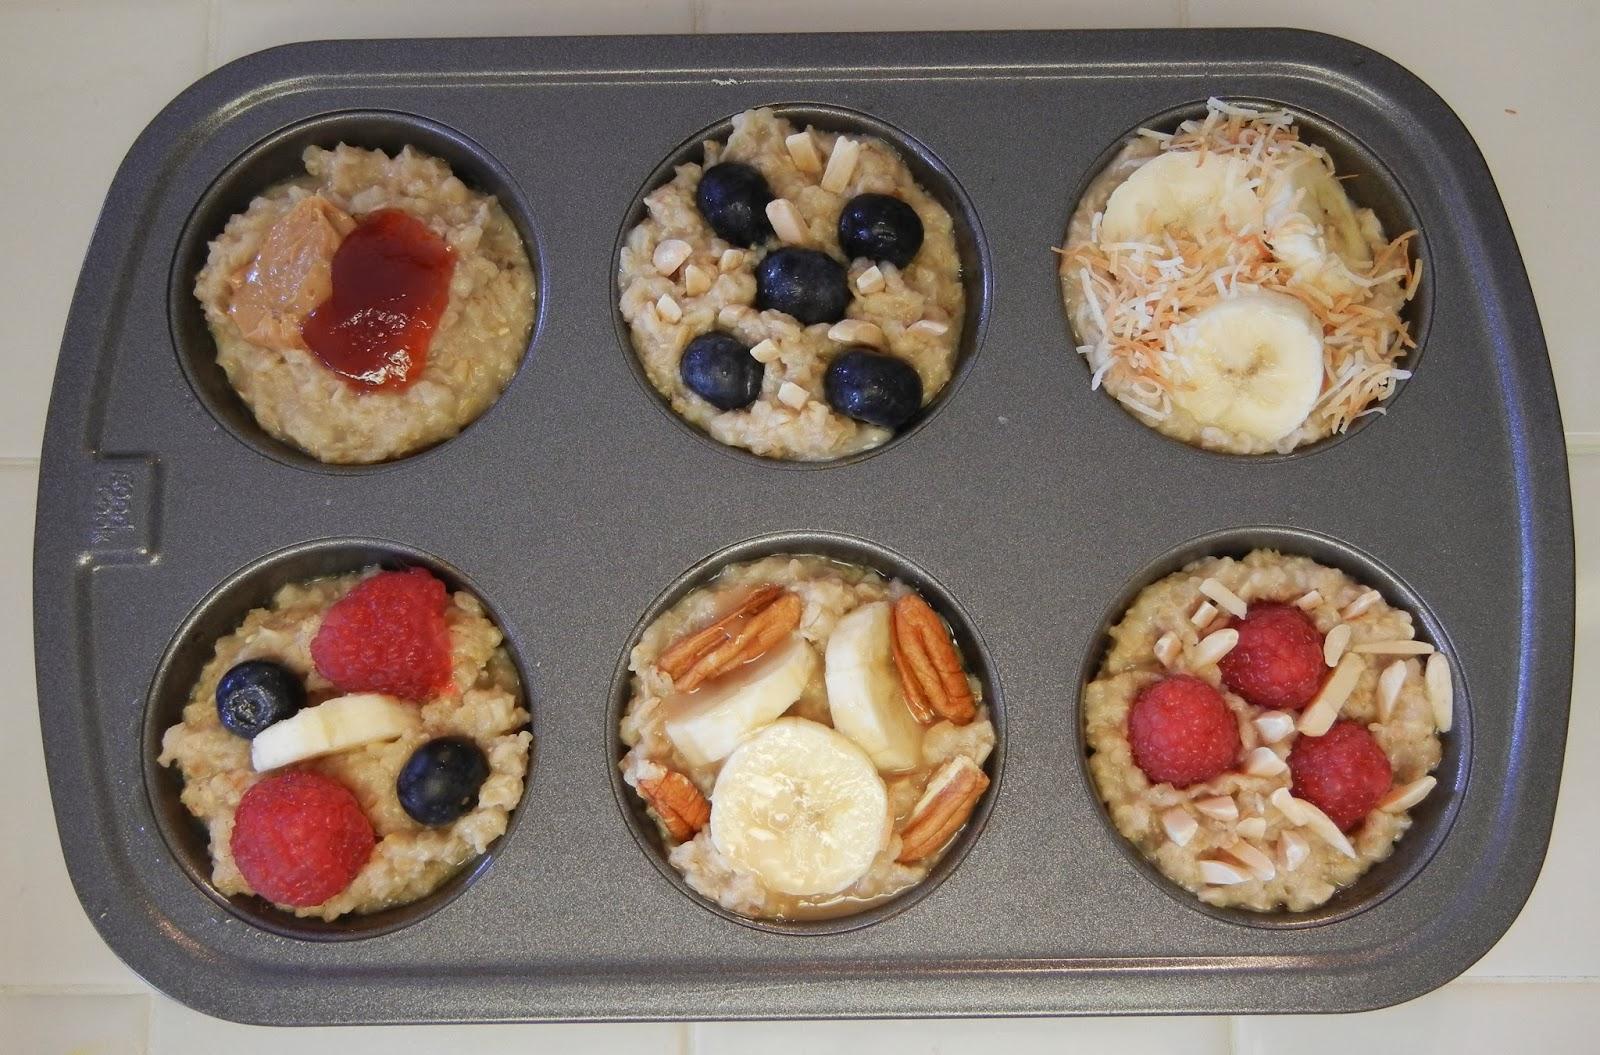 Eggface+Frozen+Oatmeal+Patties Weight Loss Recipes Quick Breakfast: Frozen Oatmeal Discs